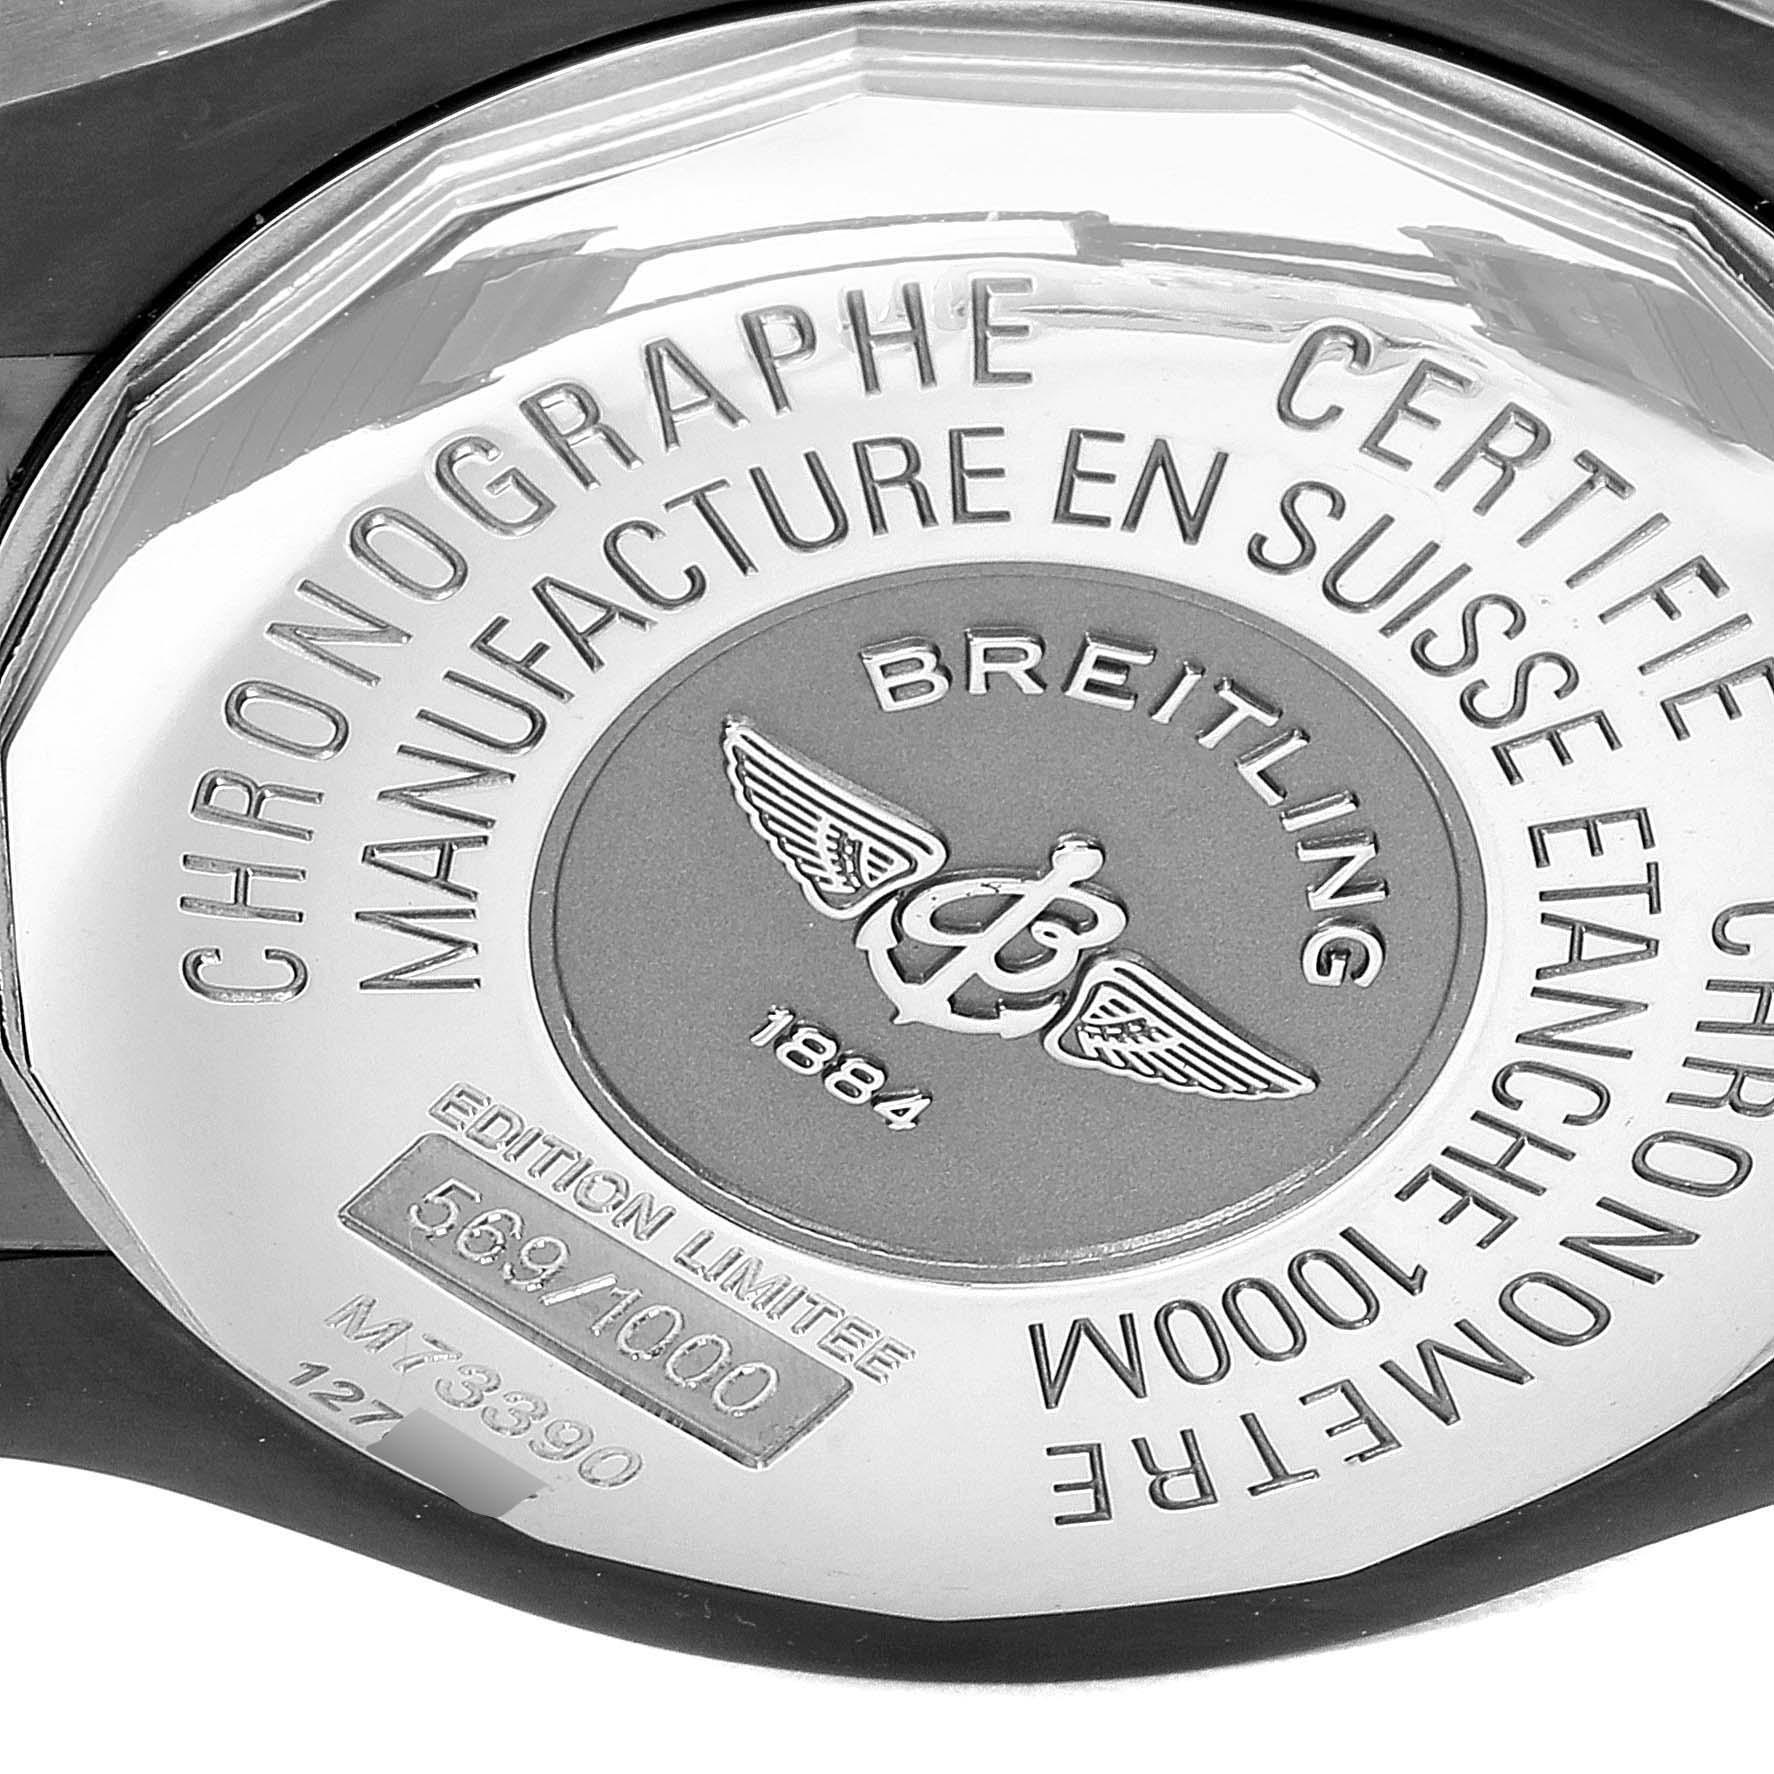 Breitling Avenger Seawolf Blacksteel Chrono Orange Hands Watch M73390 Unworn SwissWatchExpo